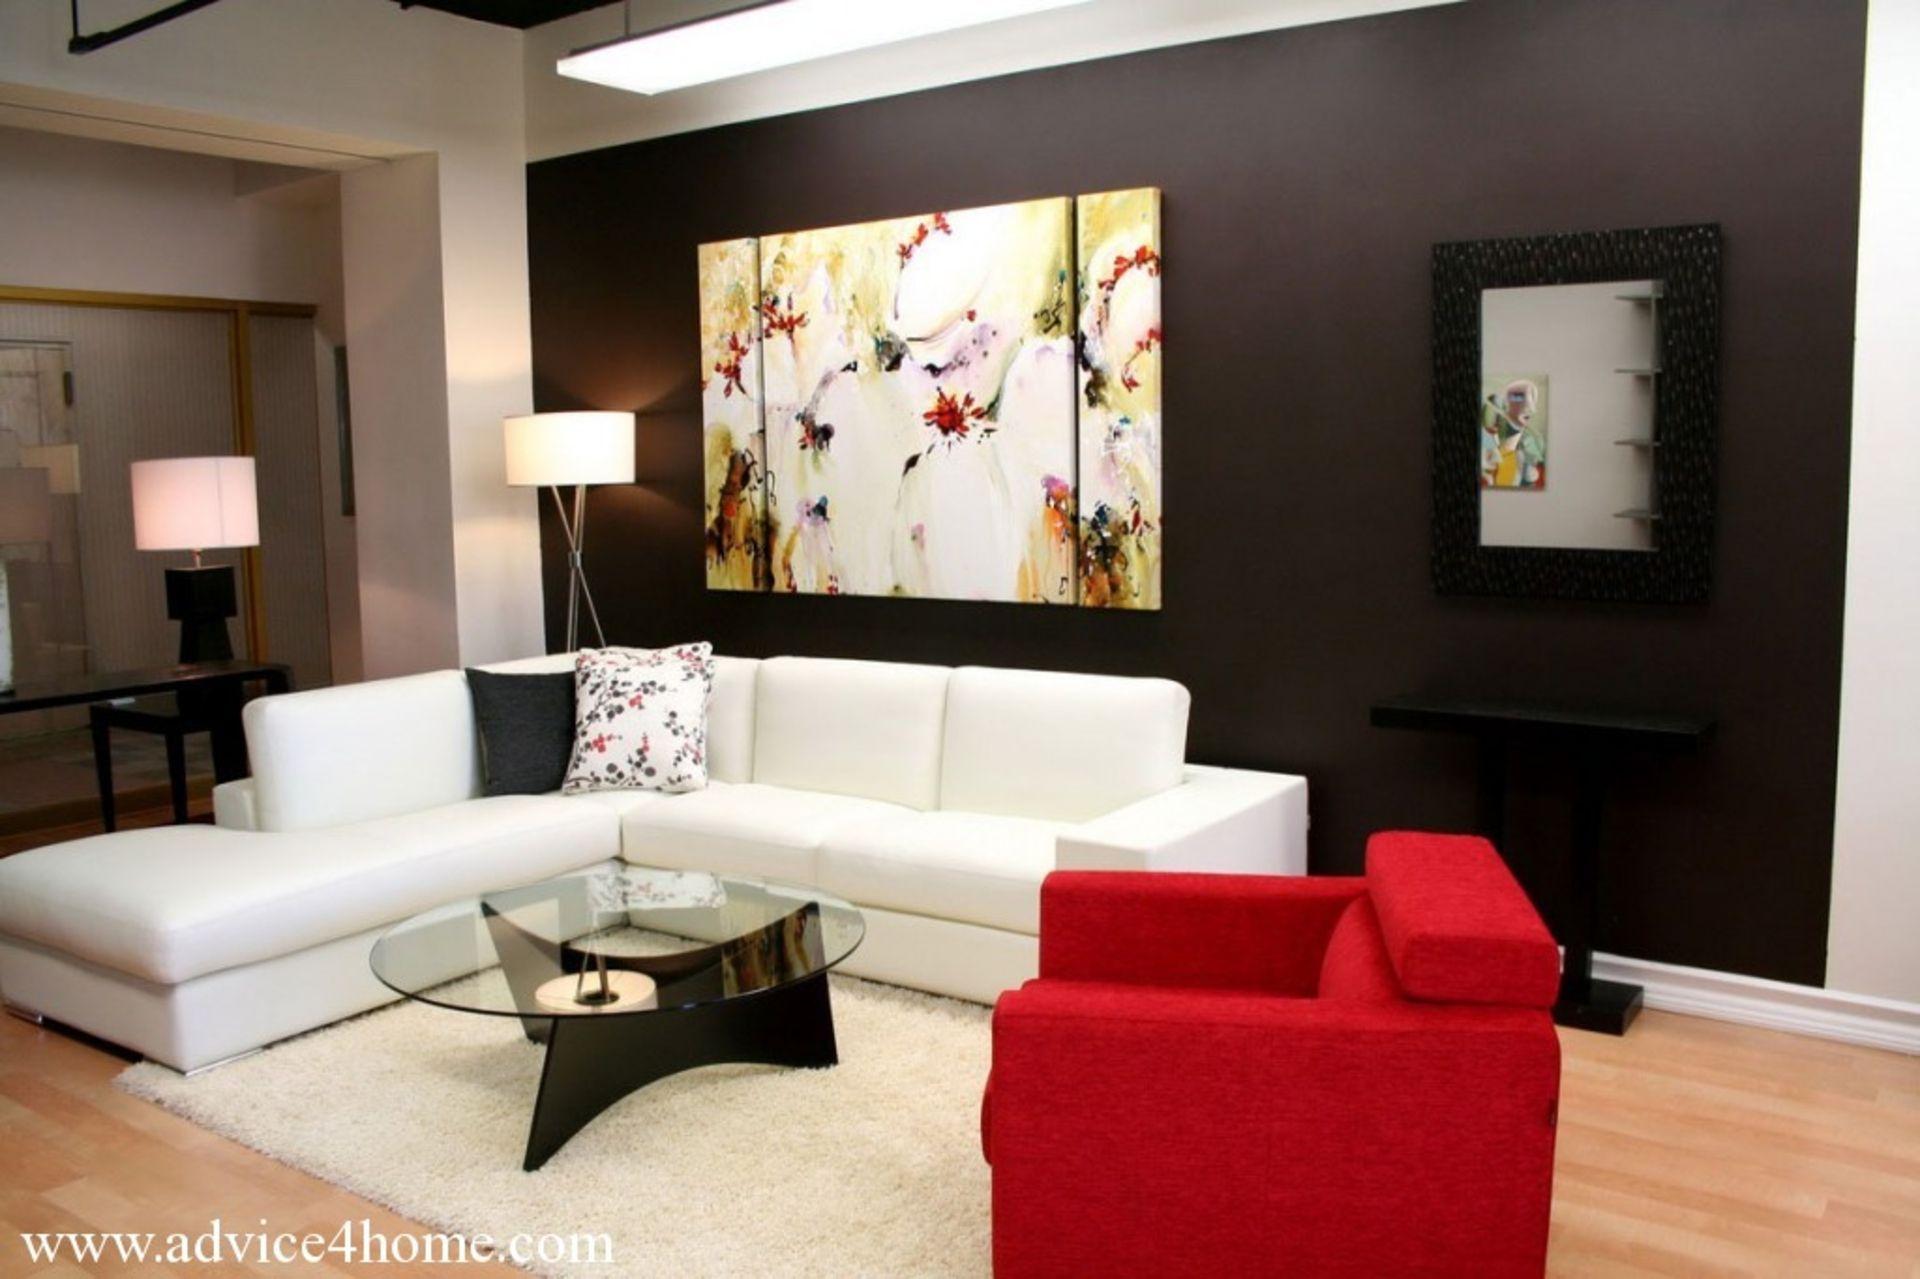 Wohnzimmer Ideen Rote Wand Bambus Im Wohnzimmer Royalcleaning Club